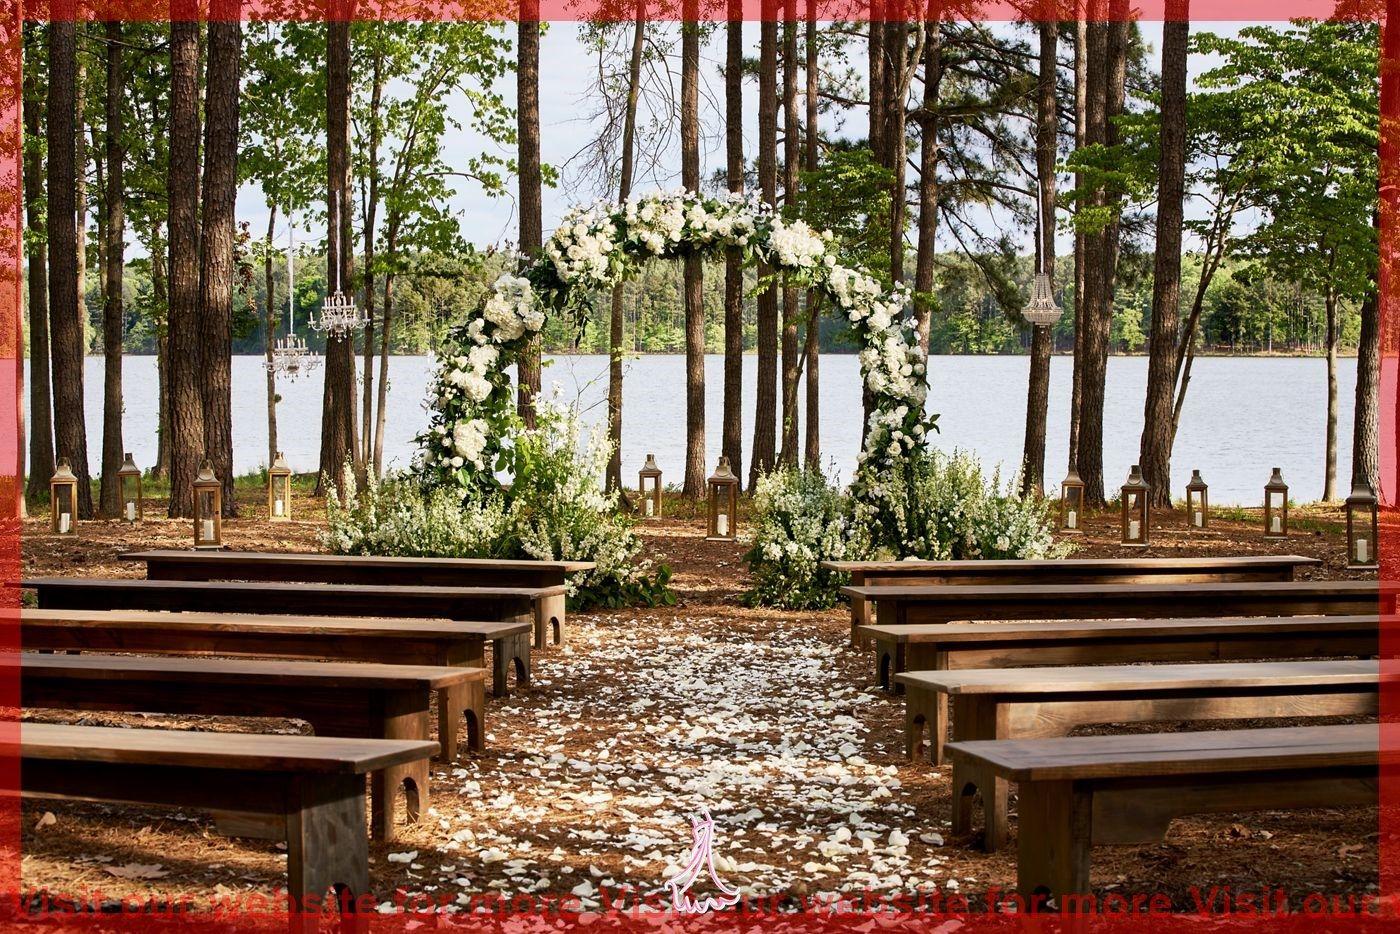 Best wedding venues texas san antonio in 2020 (With images